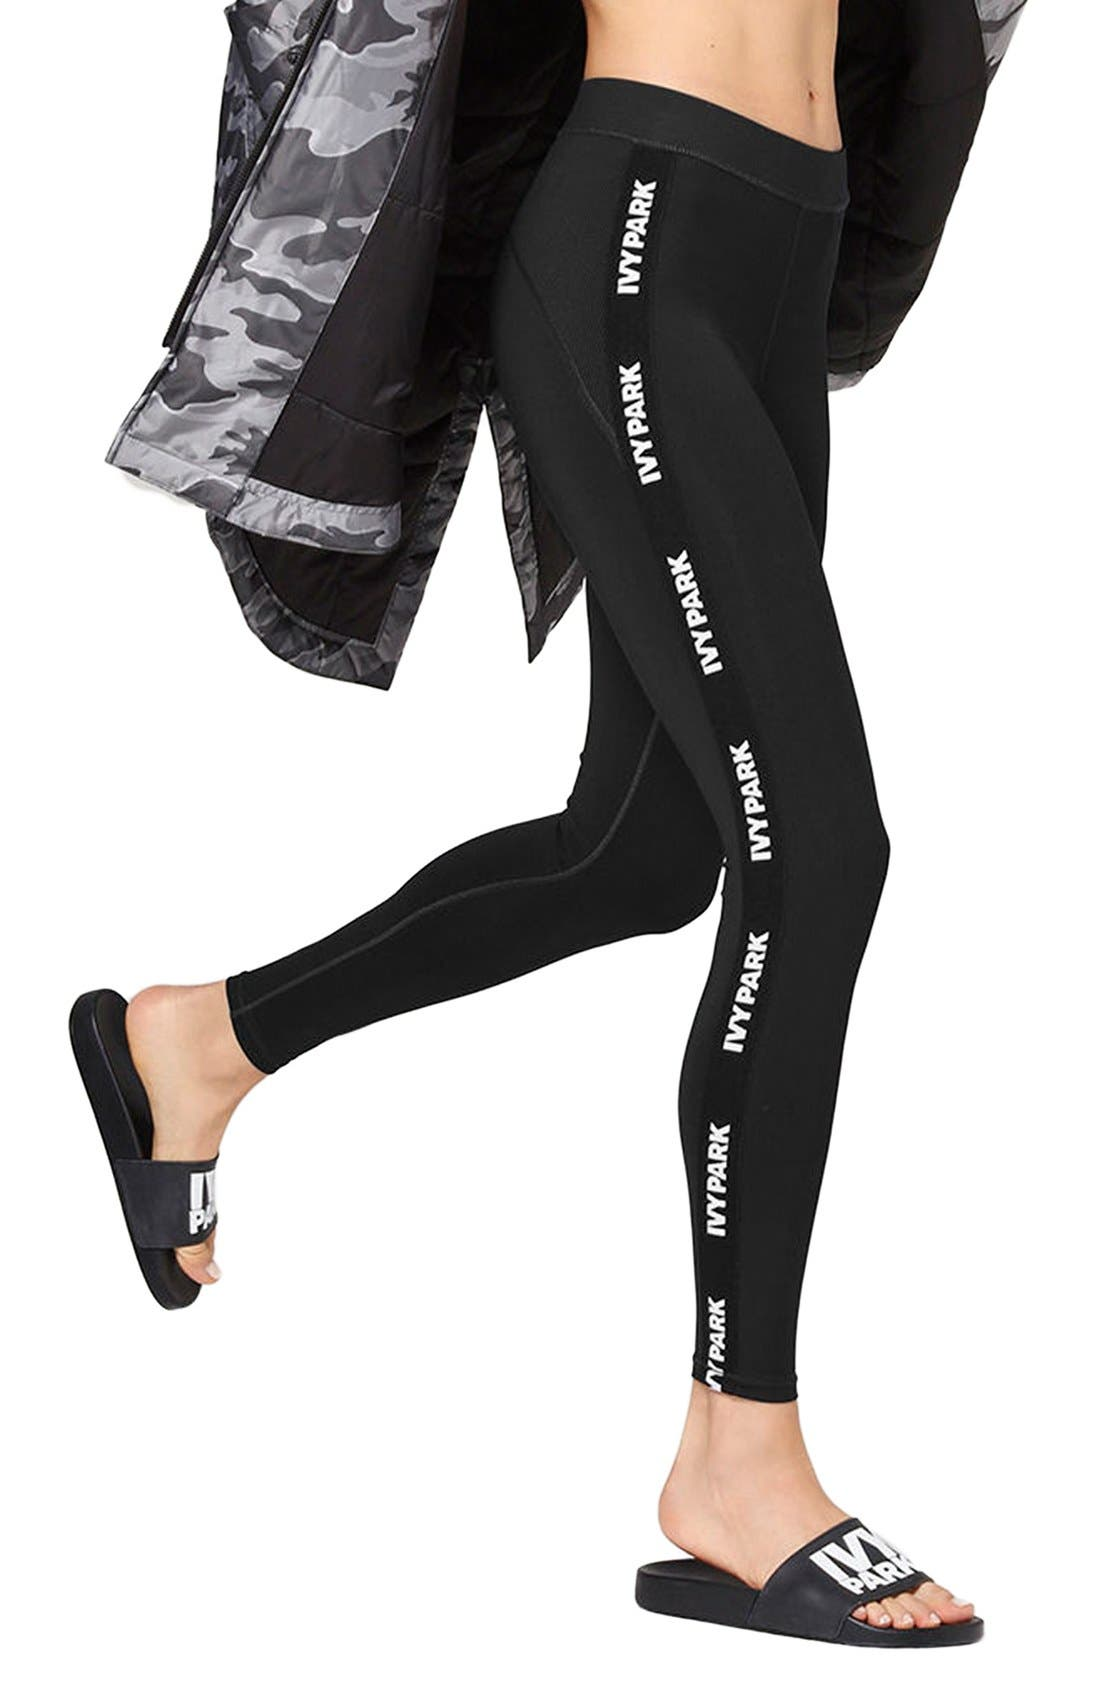 Alternate Image 1 Selected - IVY PARK® Elastic Logo Mid Rise Leggings